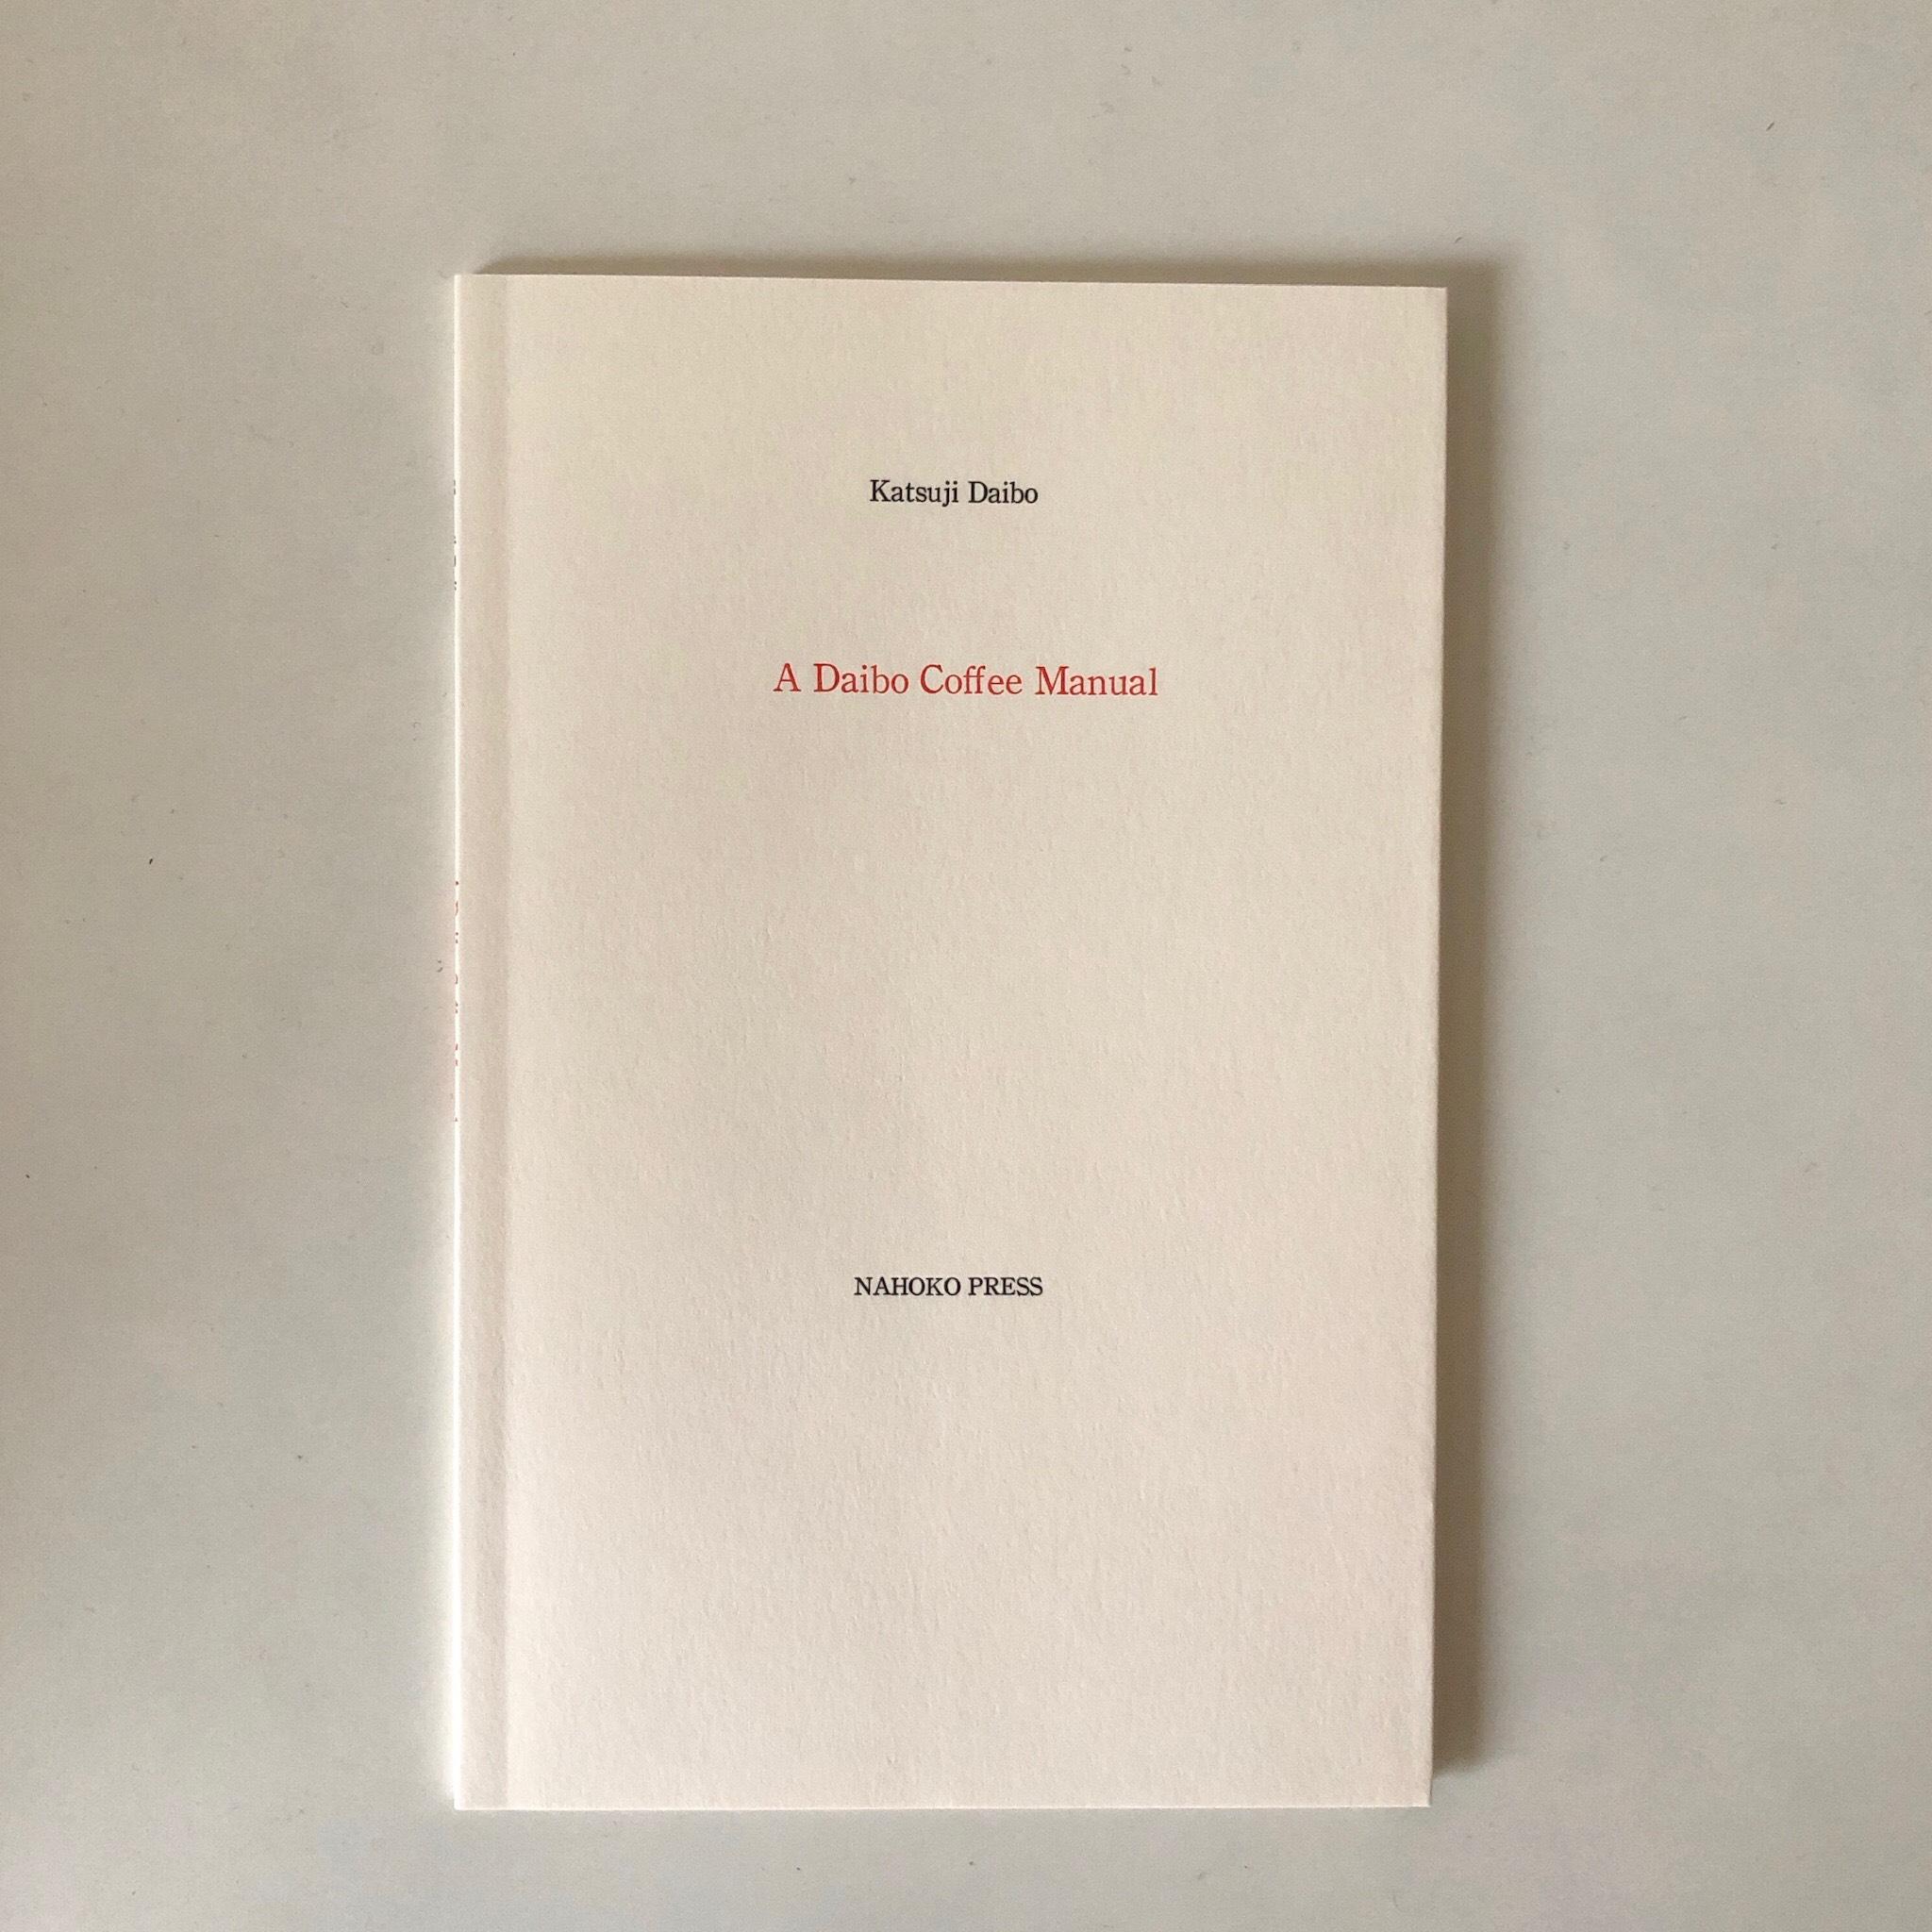 "Katsuji Daibo - ""A Daibo Coffee Manual""Softcover, H20.8 x W13.3 cm (8 x 5 inches)32 pages, Text by Katsuji Daibo (English)Design: Osamu SaruyamaTypesetting and Printing: Houbunsha Printing Co., Ltd. Published by NAHOKO PRESS, 2015ISBN978-4-9908385-0-8"